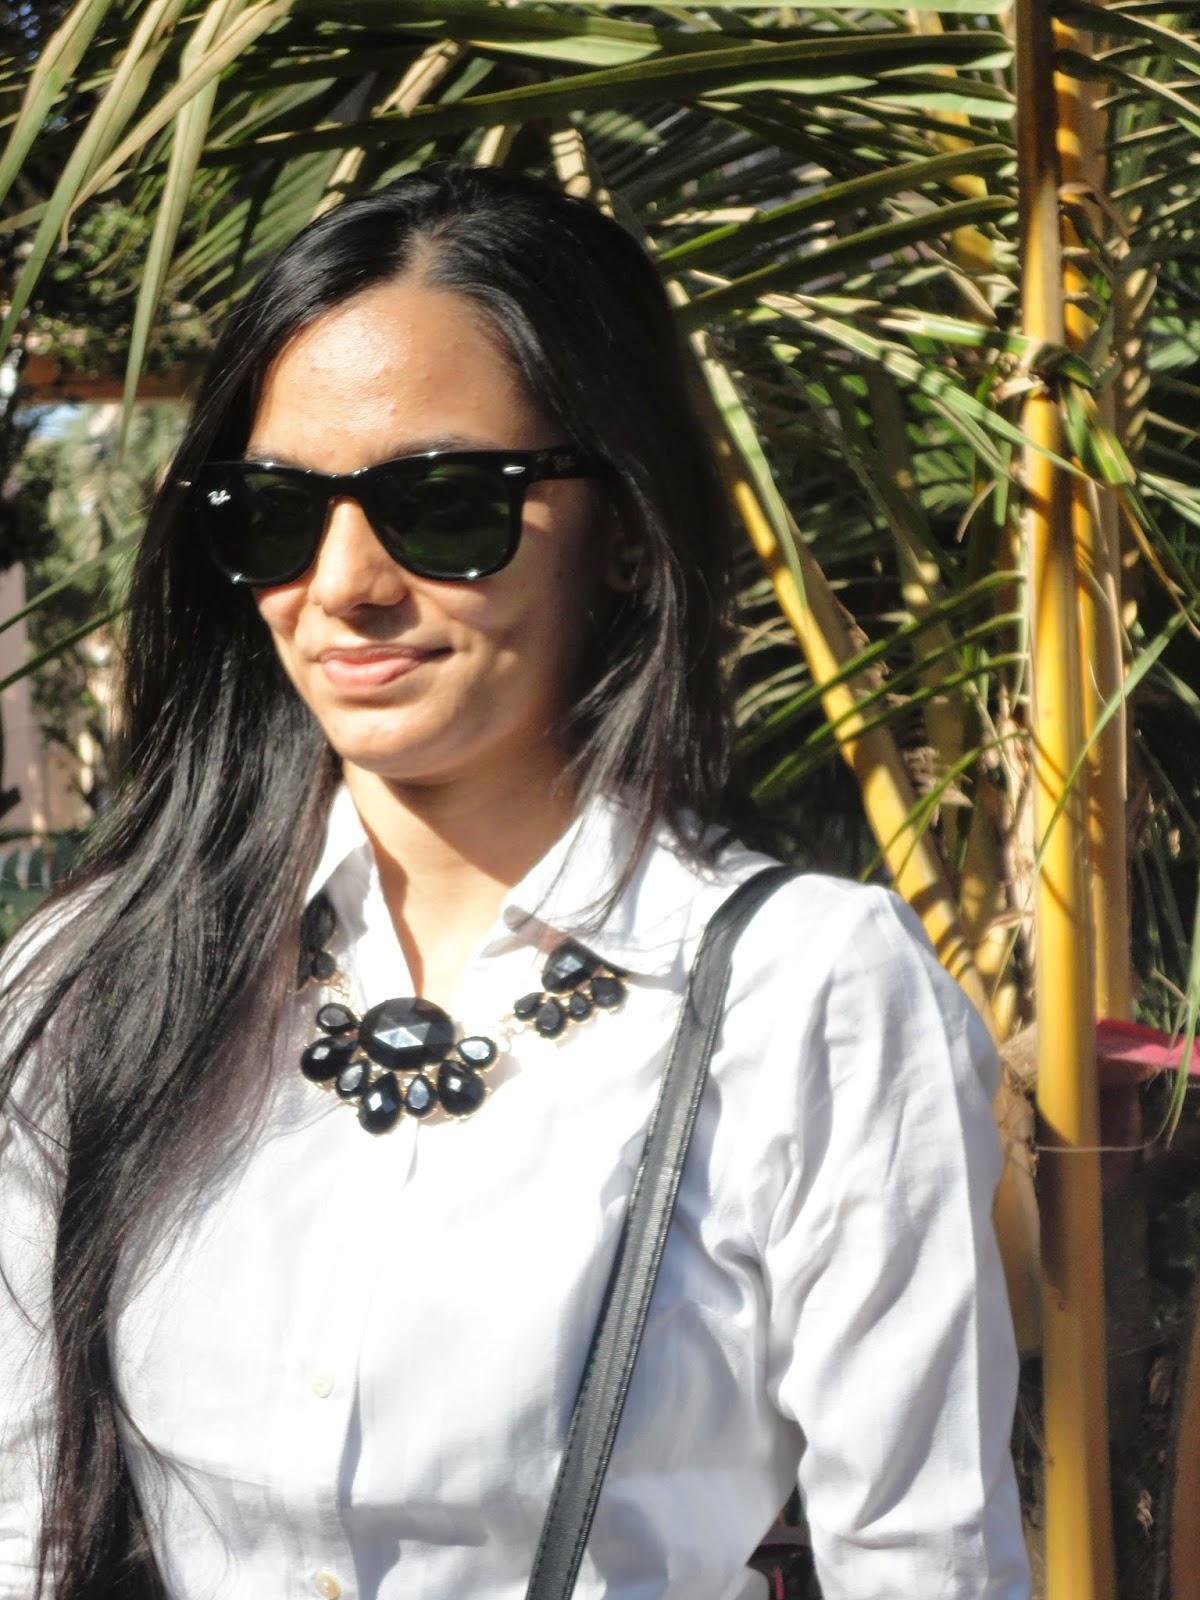 sunglasses, folding ray bans, wayfareres, workwear, satchel bag, pinstripes, statement jewellery, everyday mumbai street style